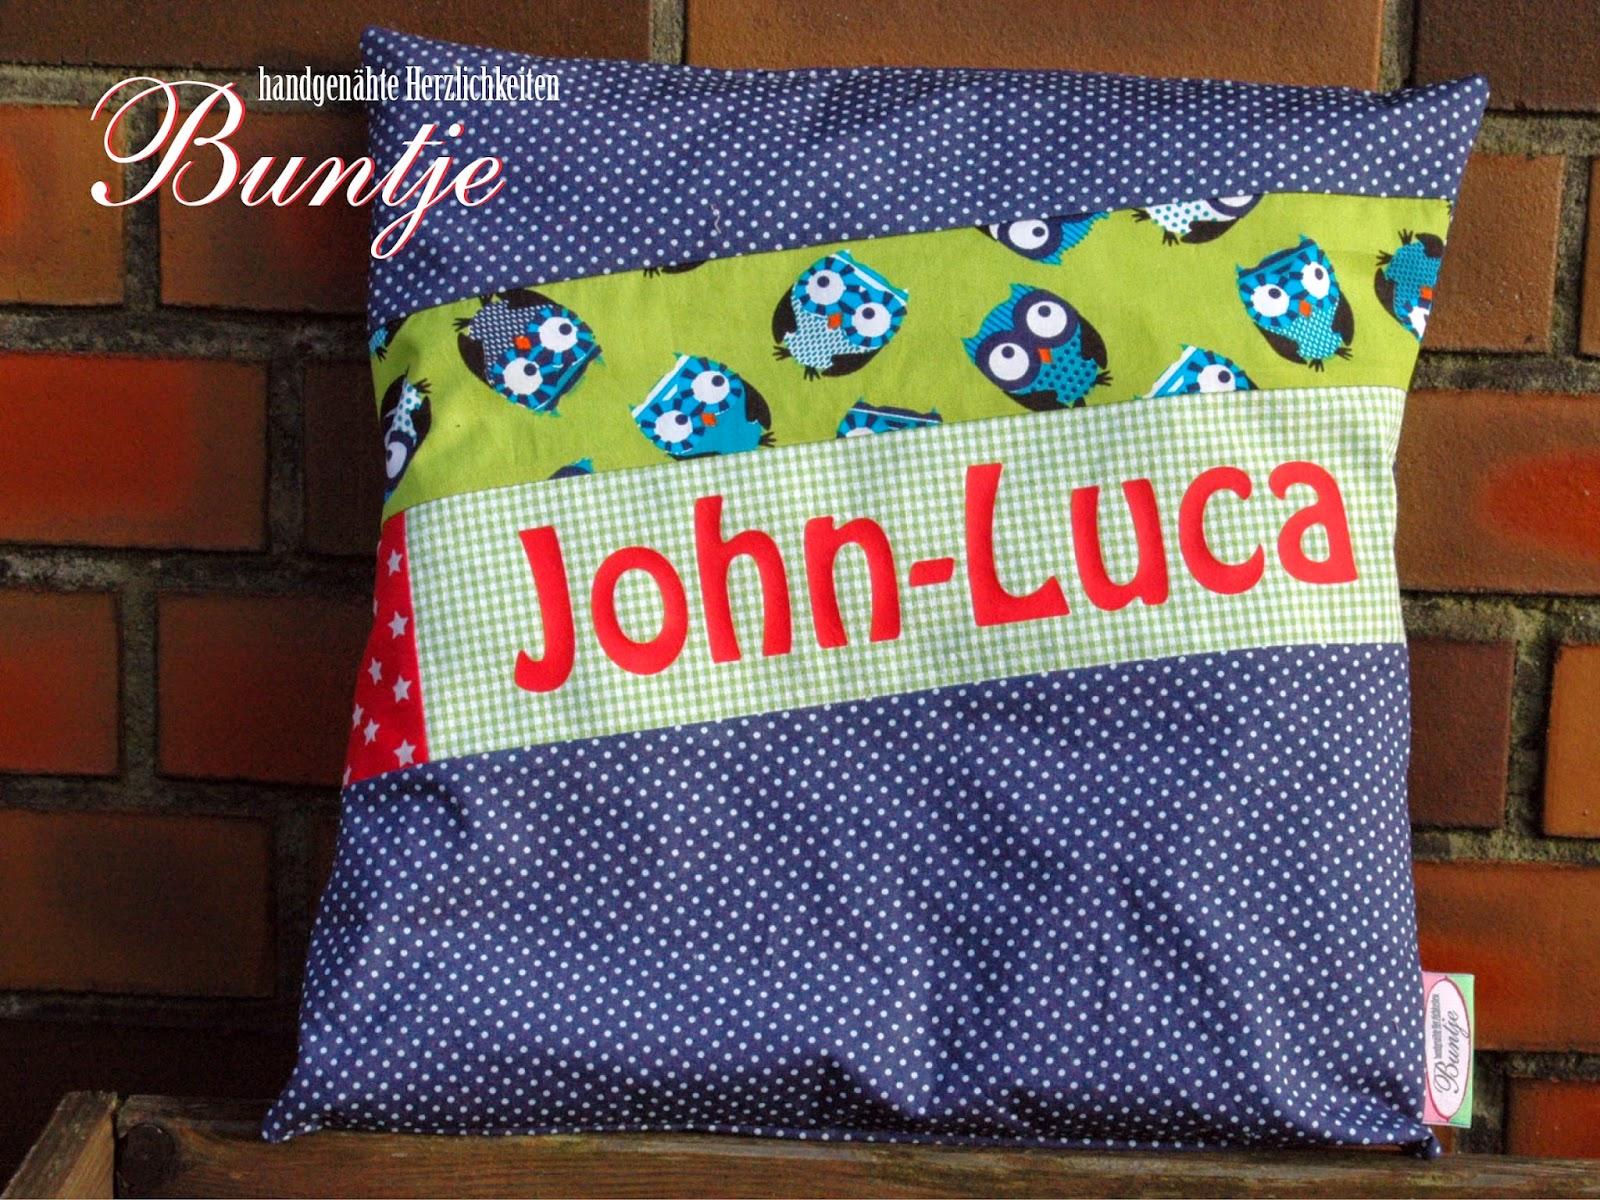 Namenskissen Kissen Name Geschenk Geburt Taufe Geburtstag Junge blau grün Eulen Tiere John Luca Buntje nähen handmade